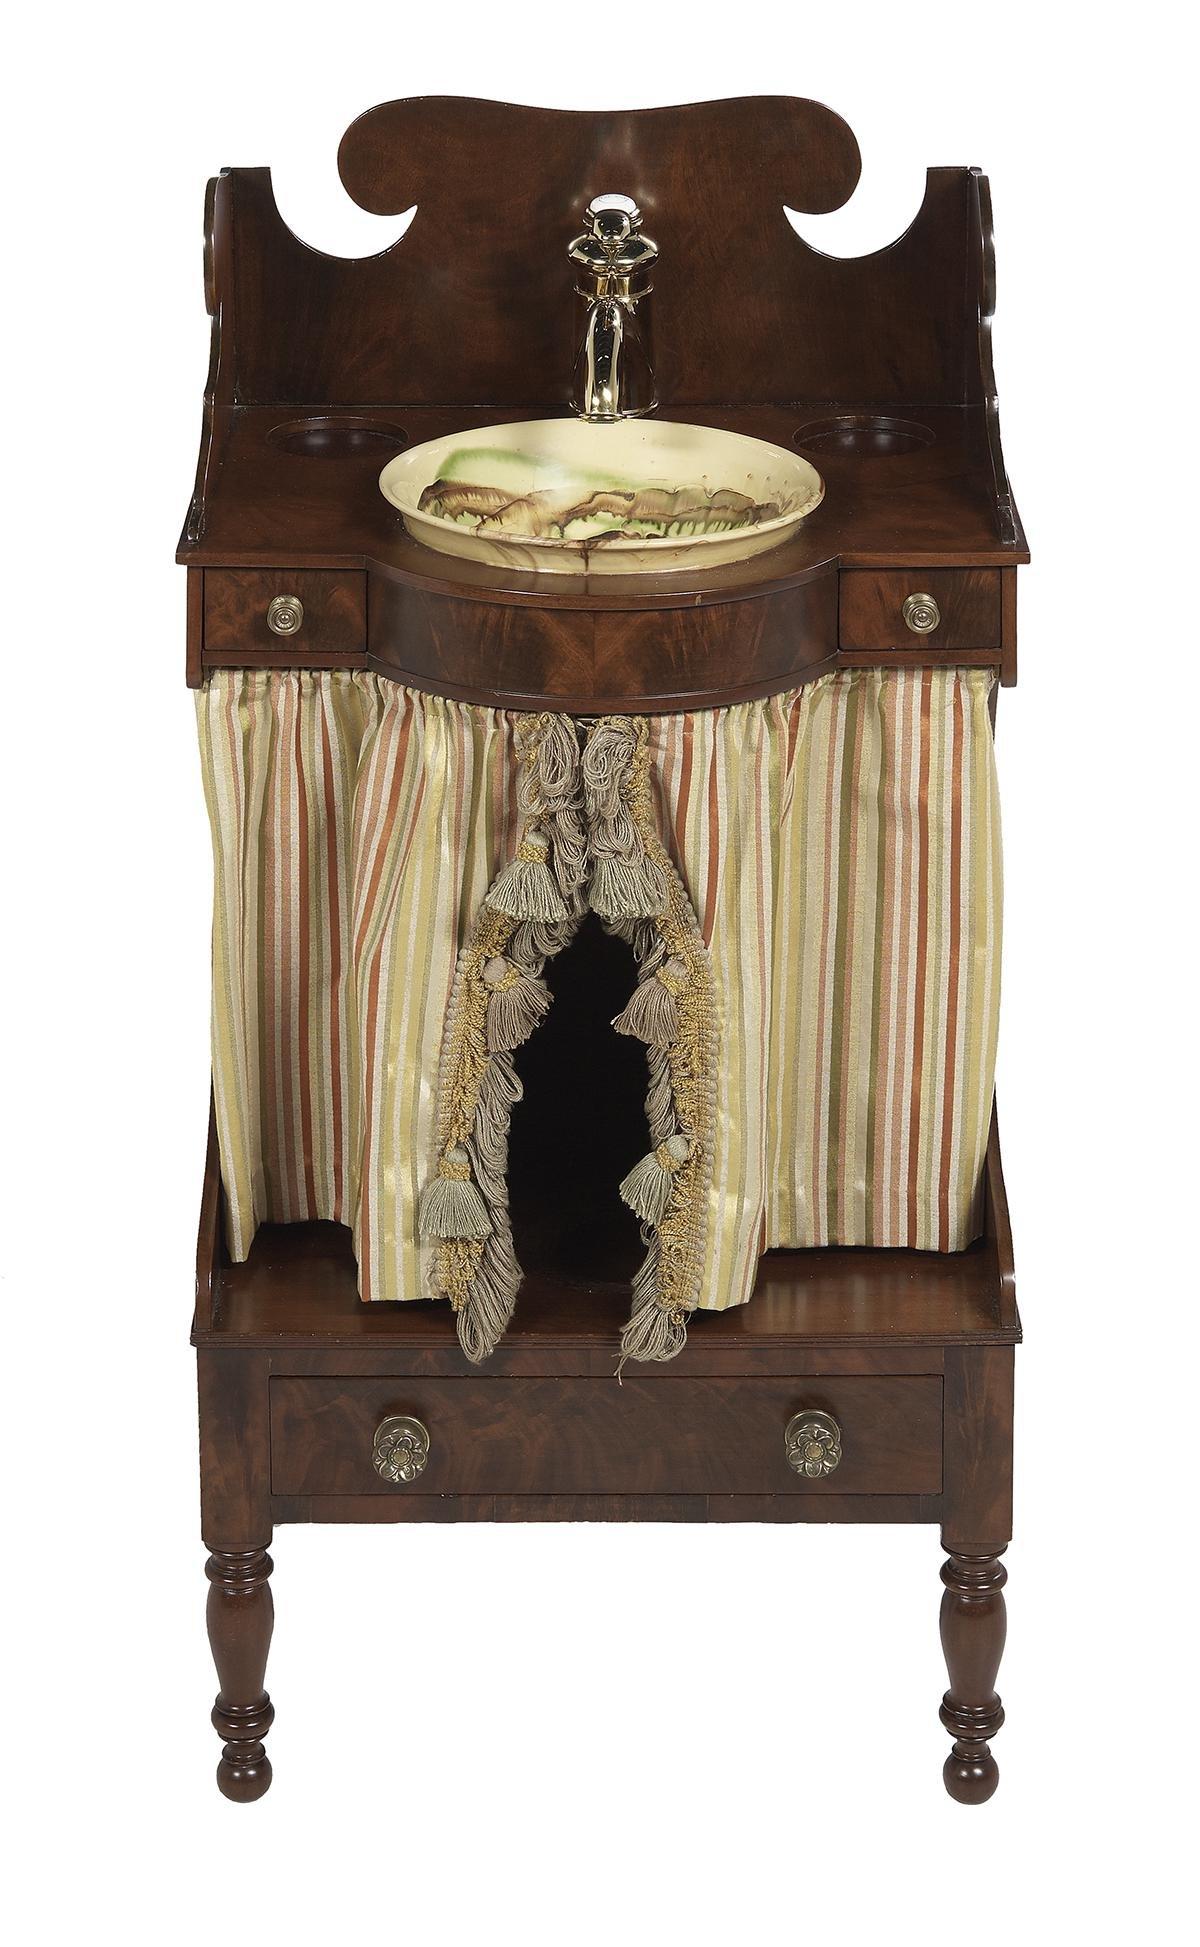 Period Federal Mahogany Retrofitted Washstand